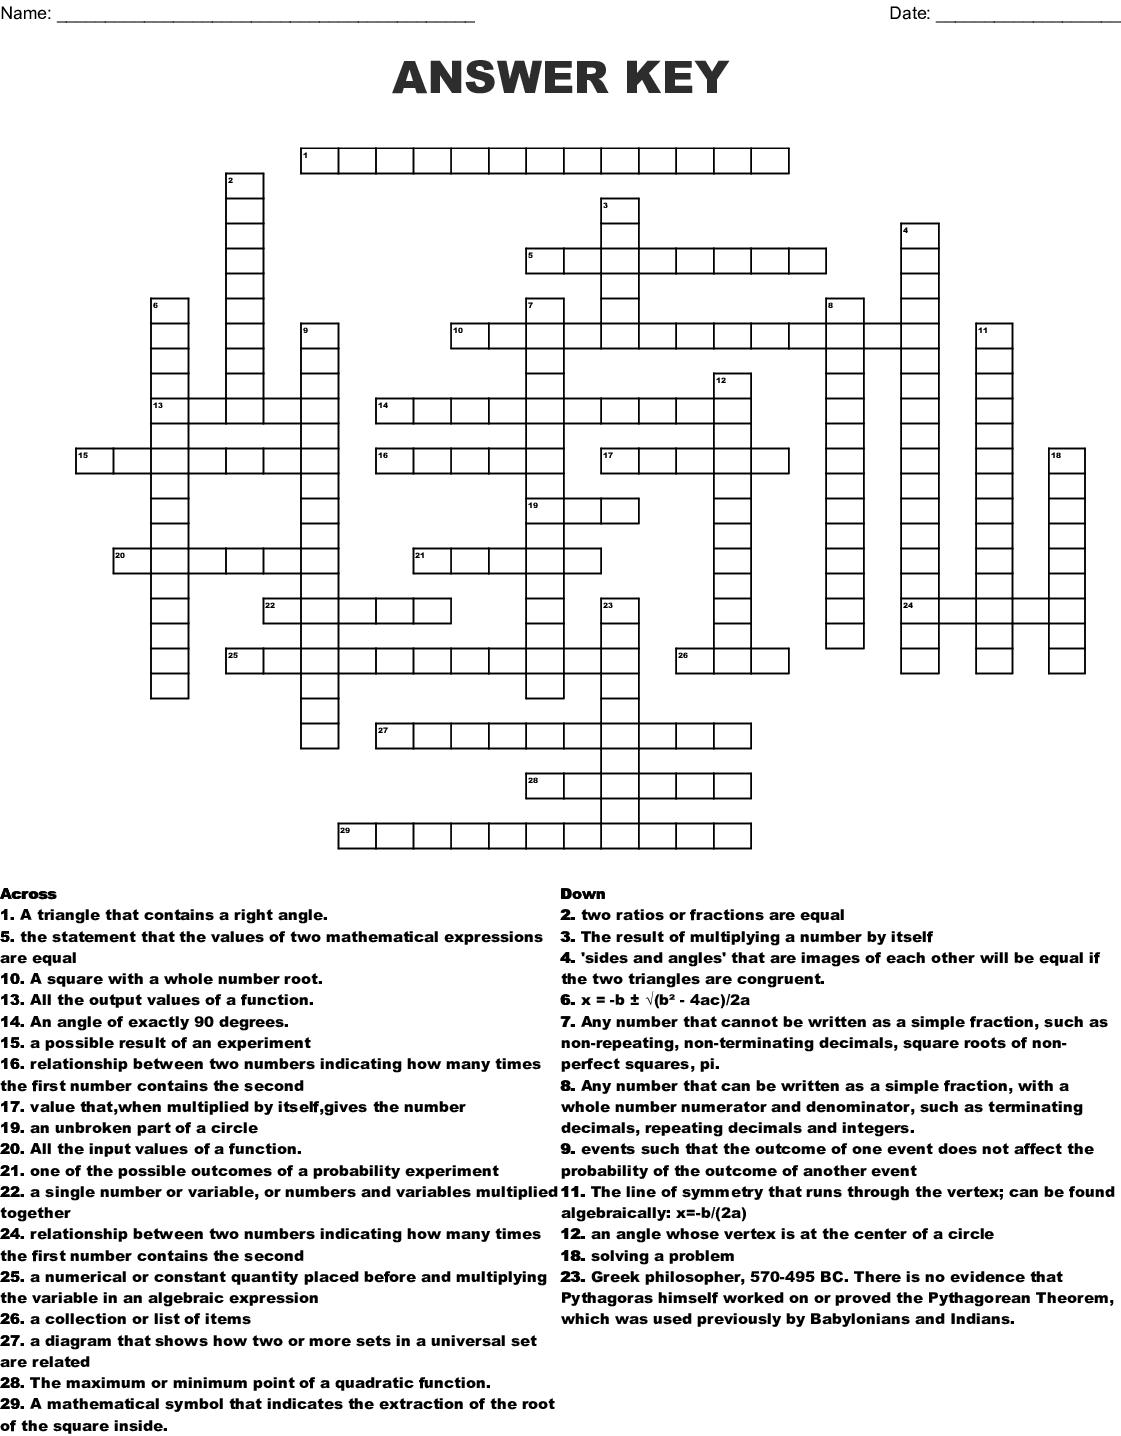 Answer Key Crossword